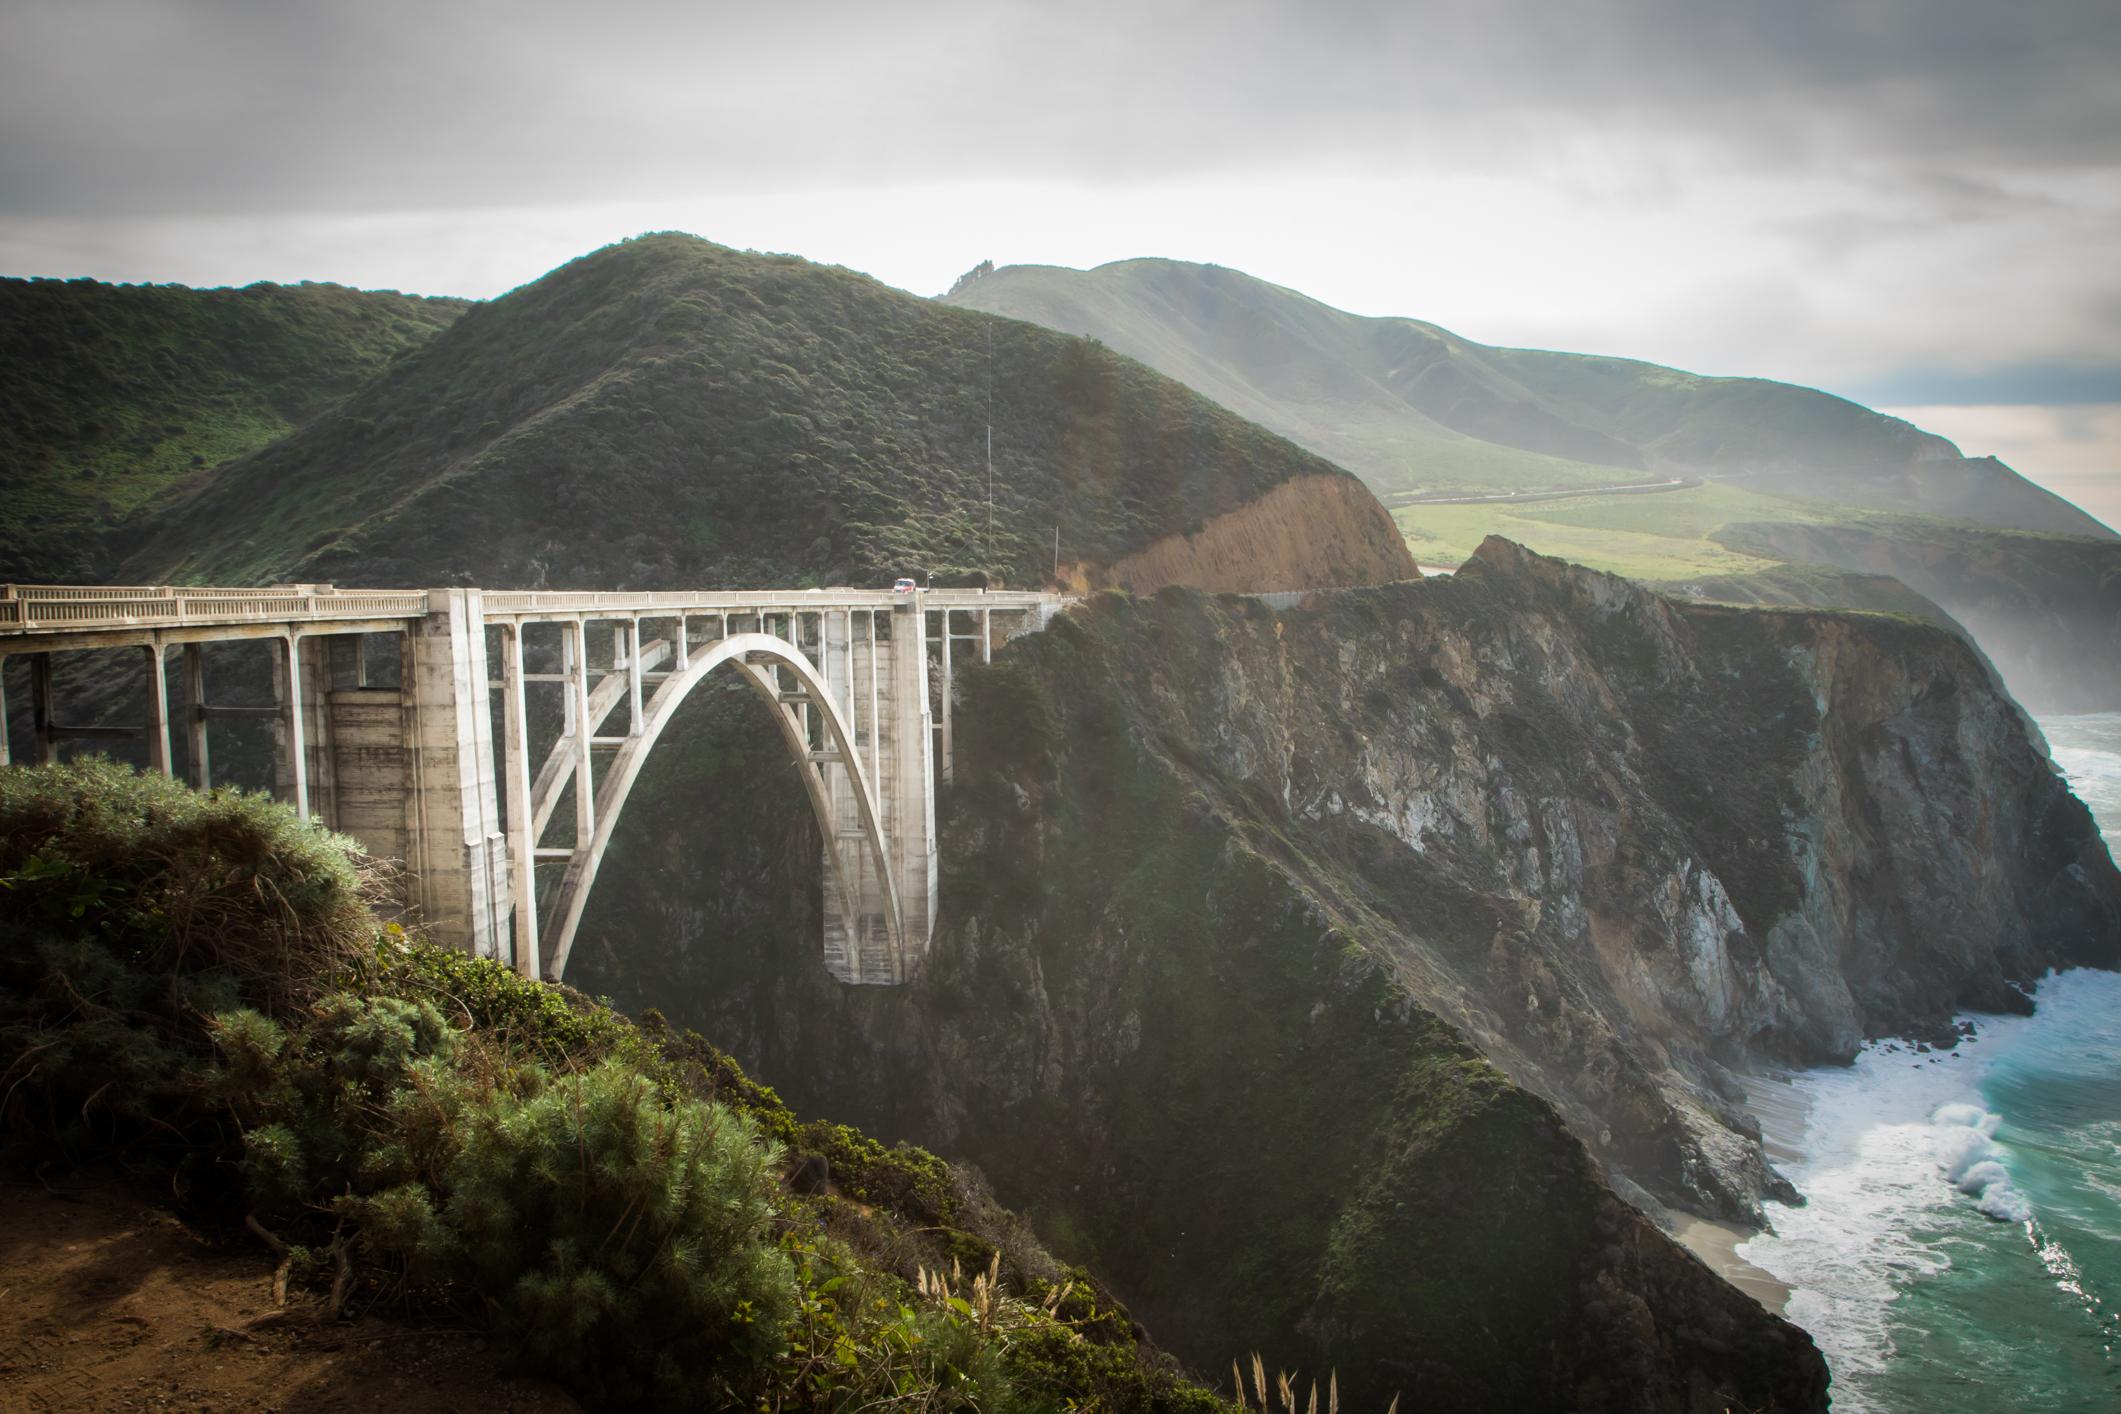 Bixby Bridge on the Pacific Coast Highway in Big Sur California Not So SAHM